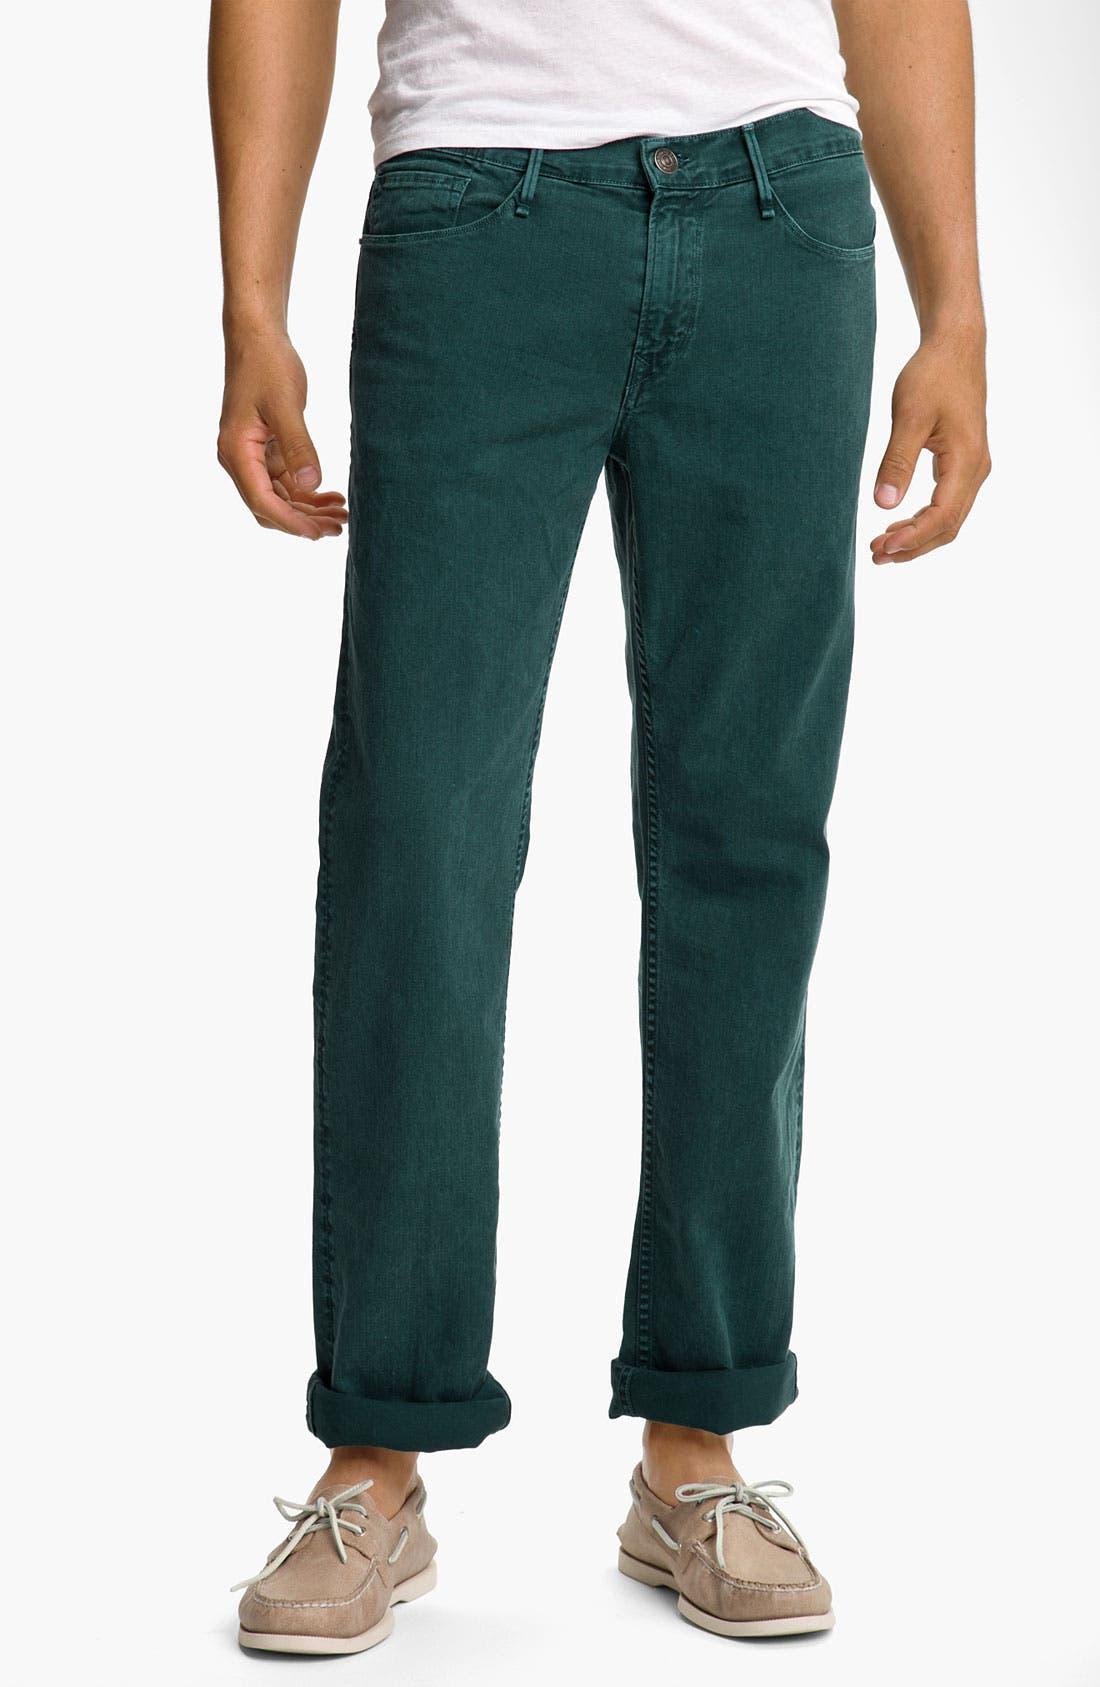 Alternate Image 1 Selected - Earnest Sewn 'Fulton' Straight Leg Twill Pants